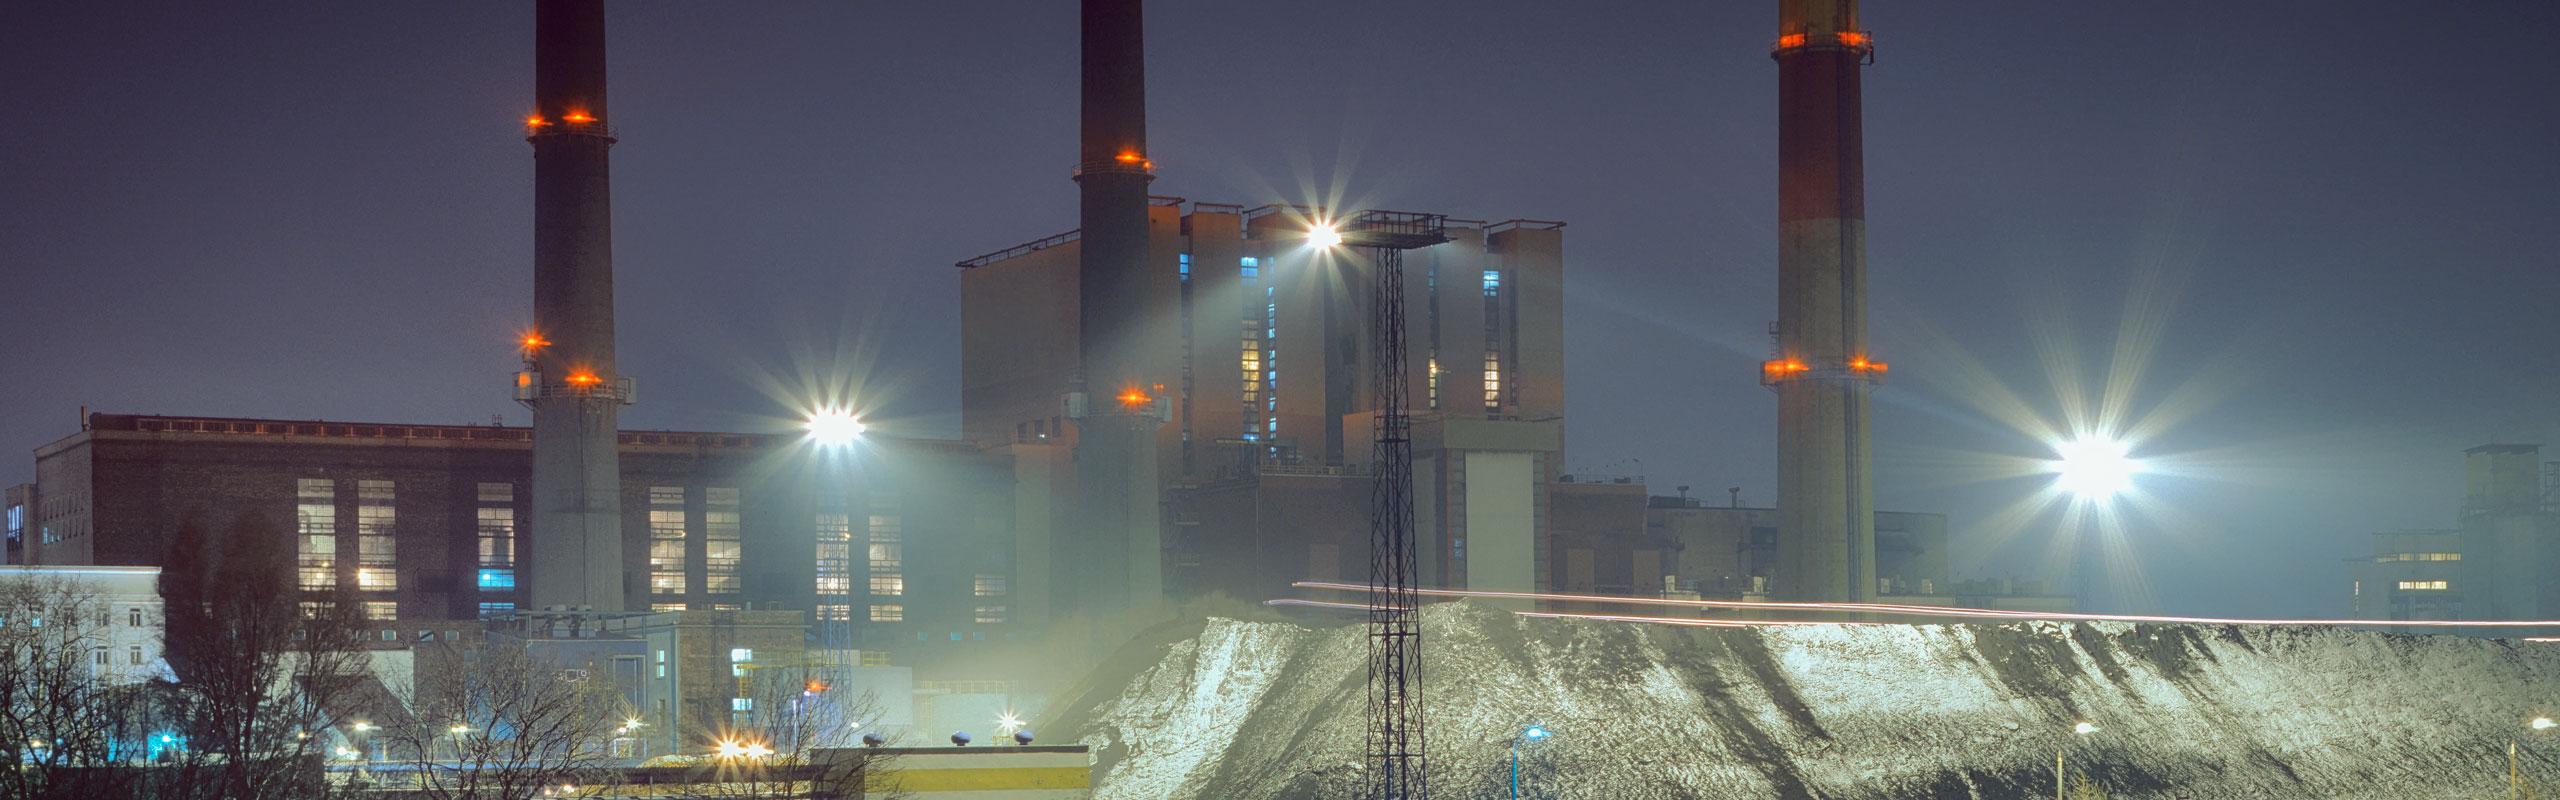 Warsaw Zerań CHP | Combined Heat&Power Plant